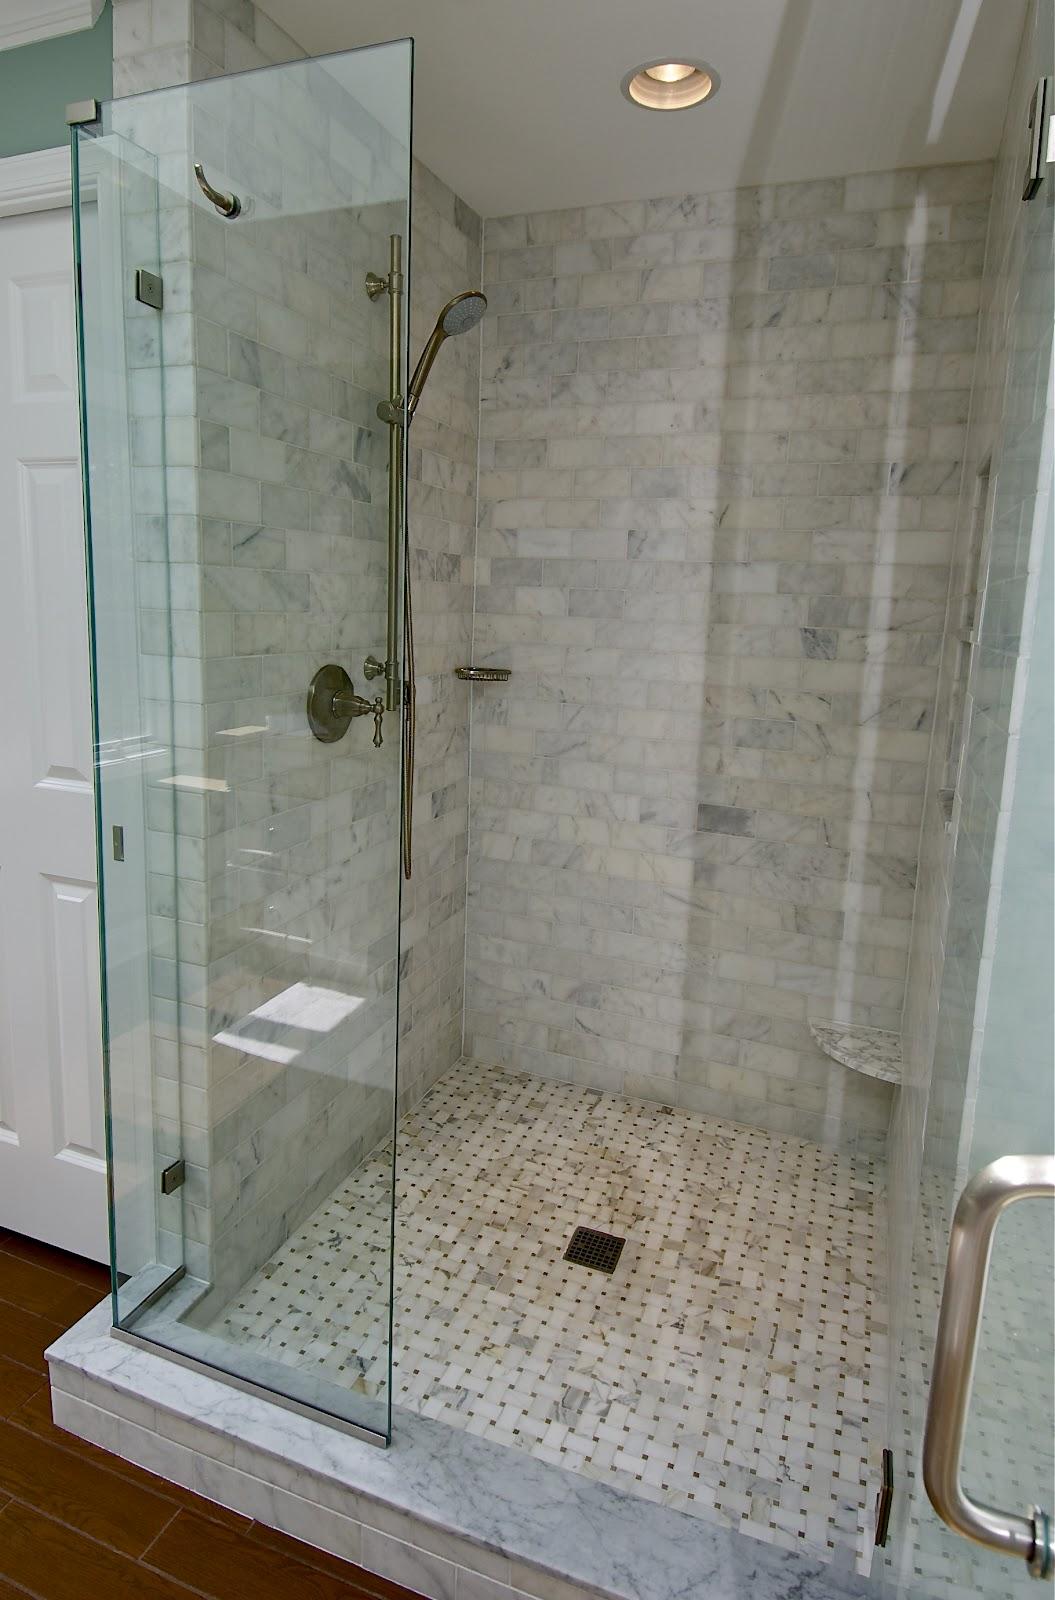 Marble Subway Tile Shower Offering the Sense of Elegance ... on Bathroom Ideas Subway Tile  id=54089